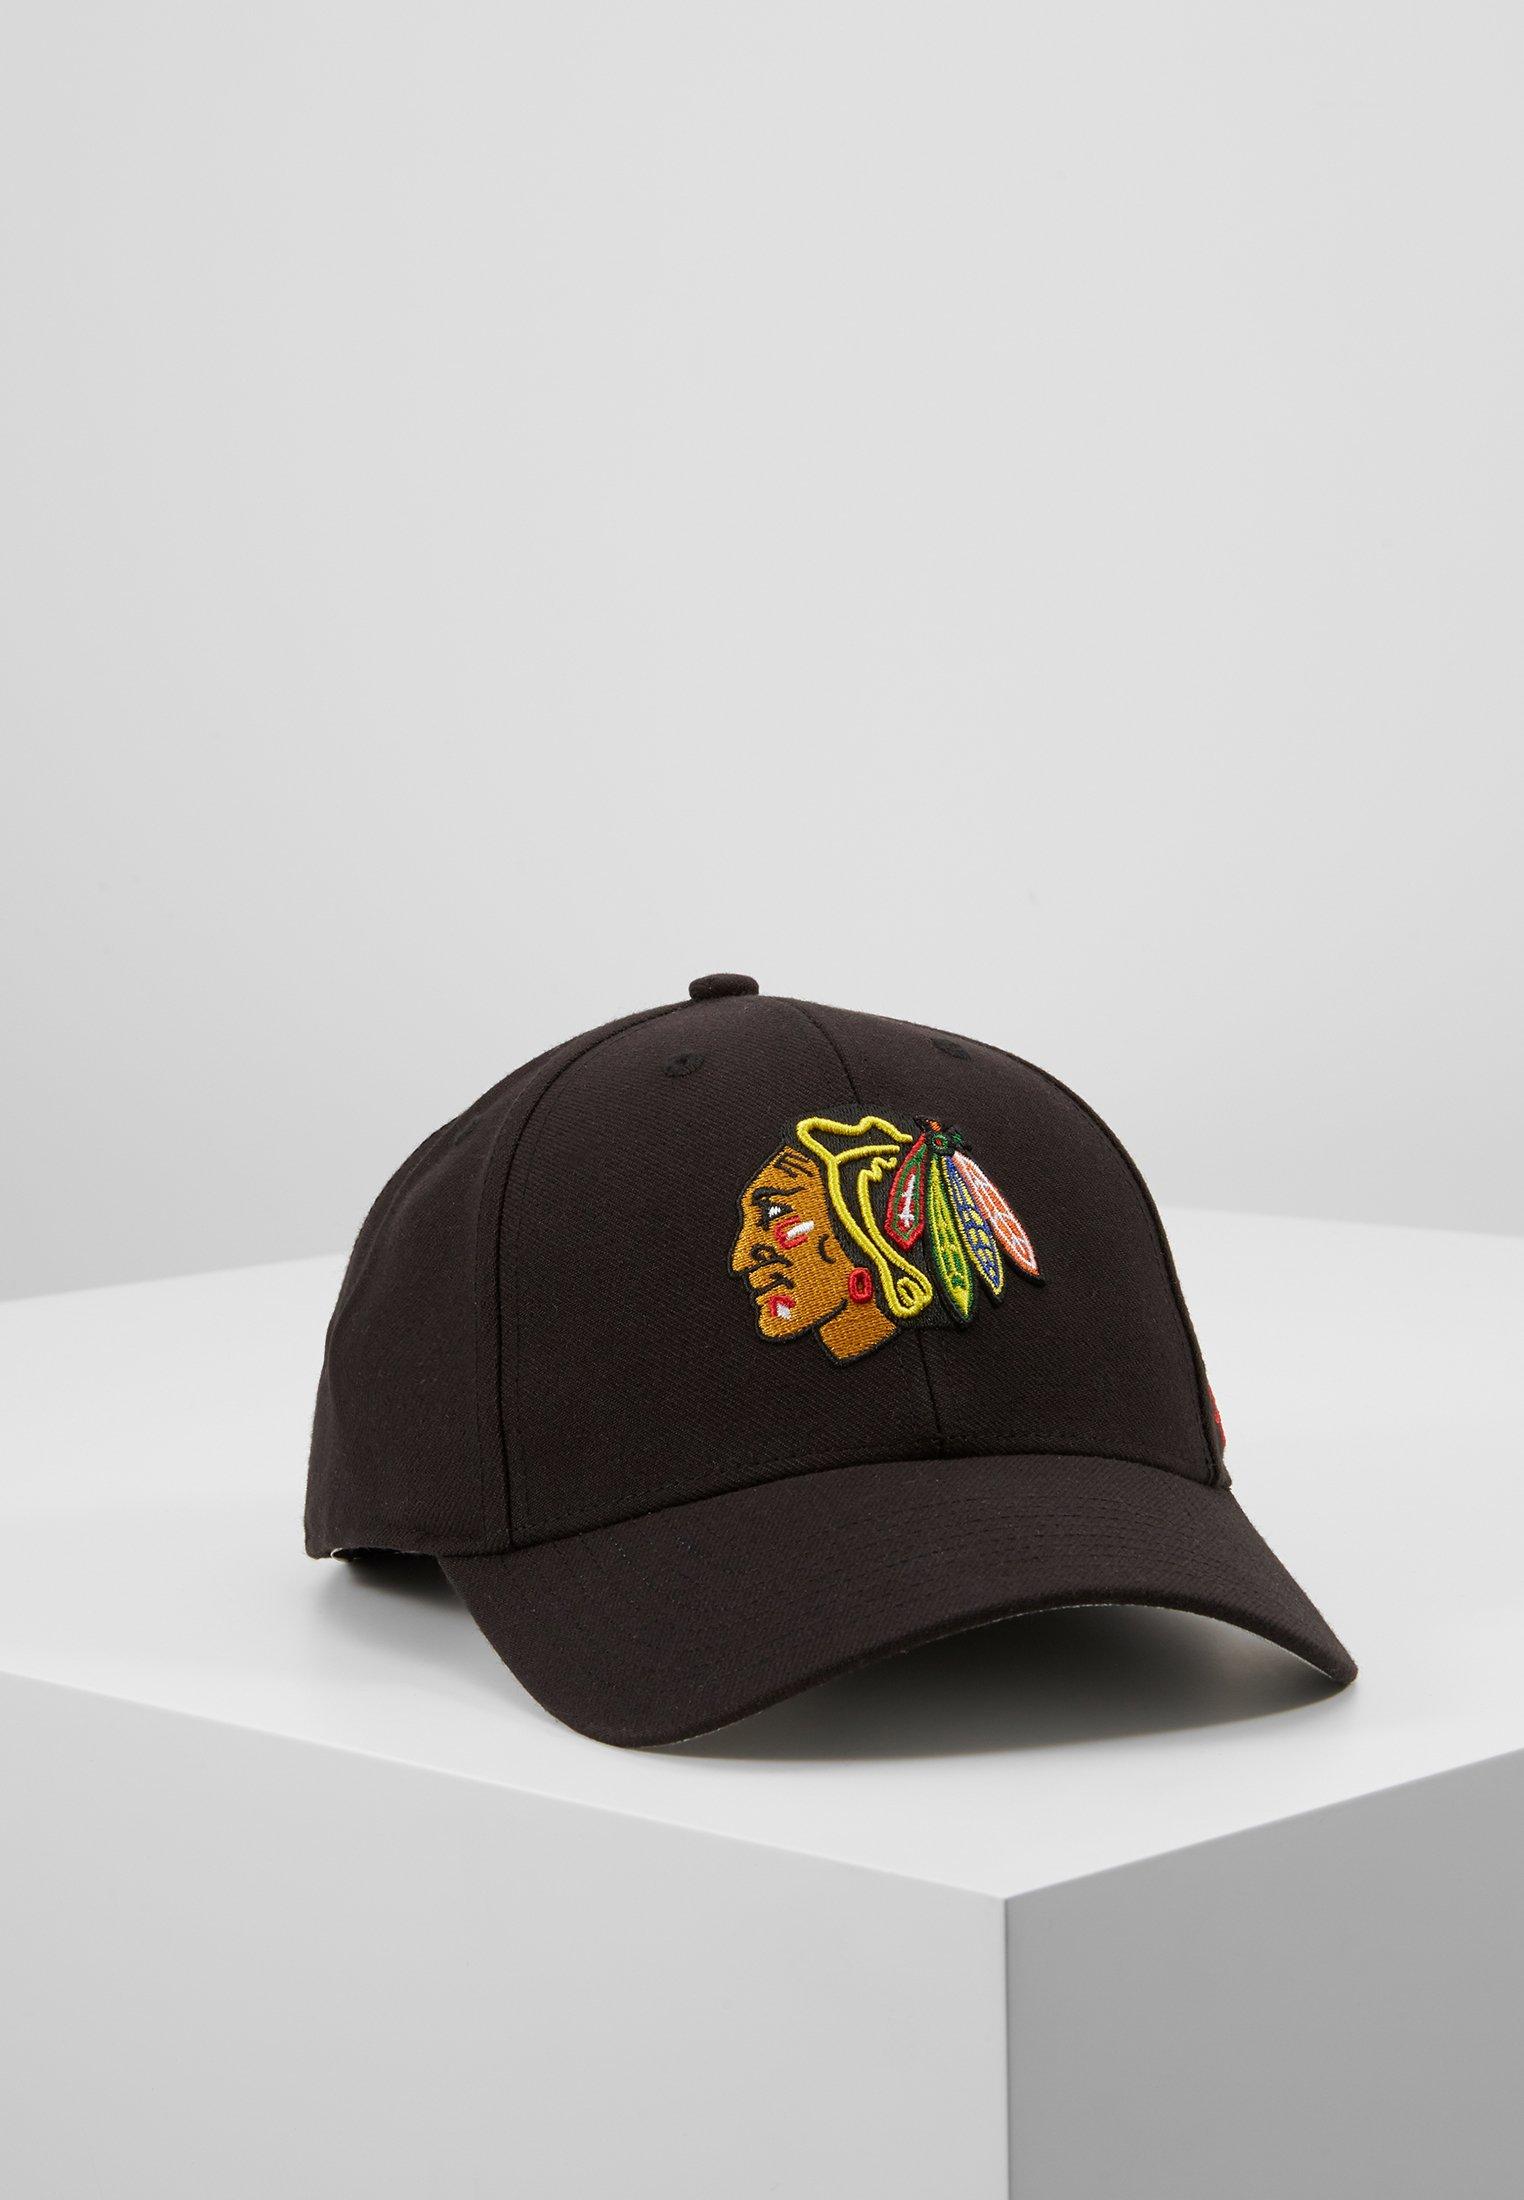 Homme NHL CHICAGO BLACKHAWKS - Casquette